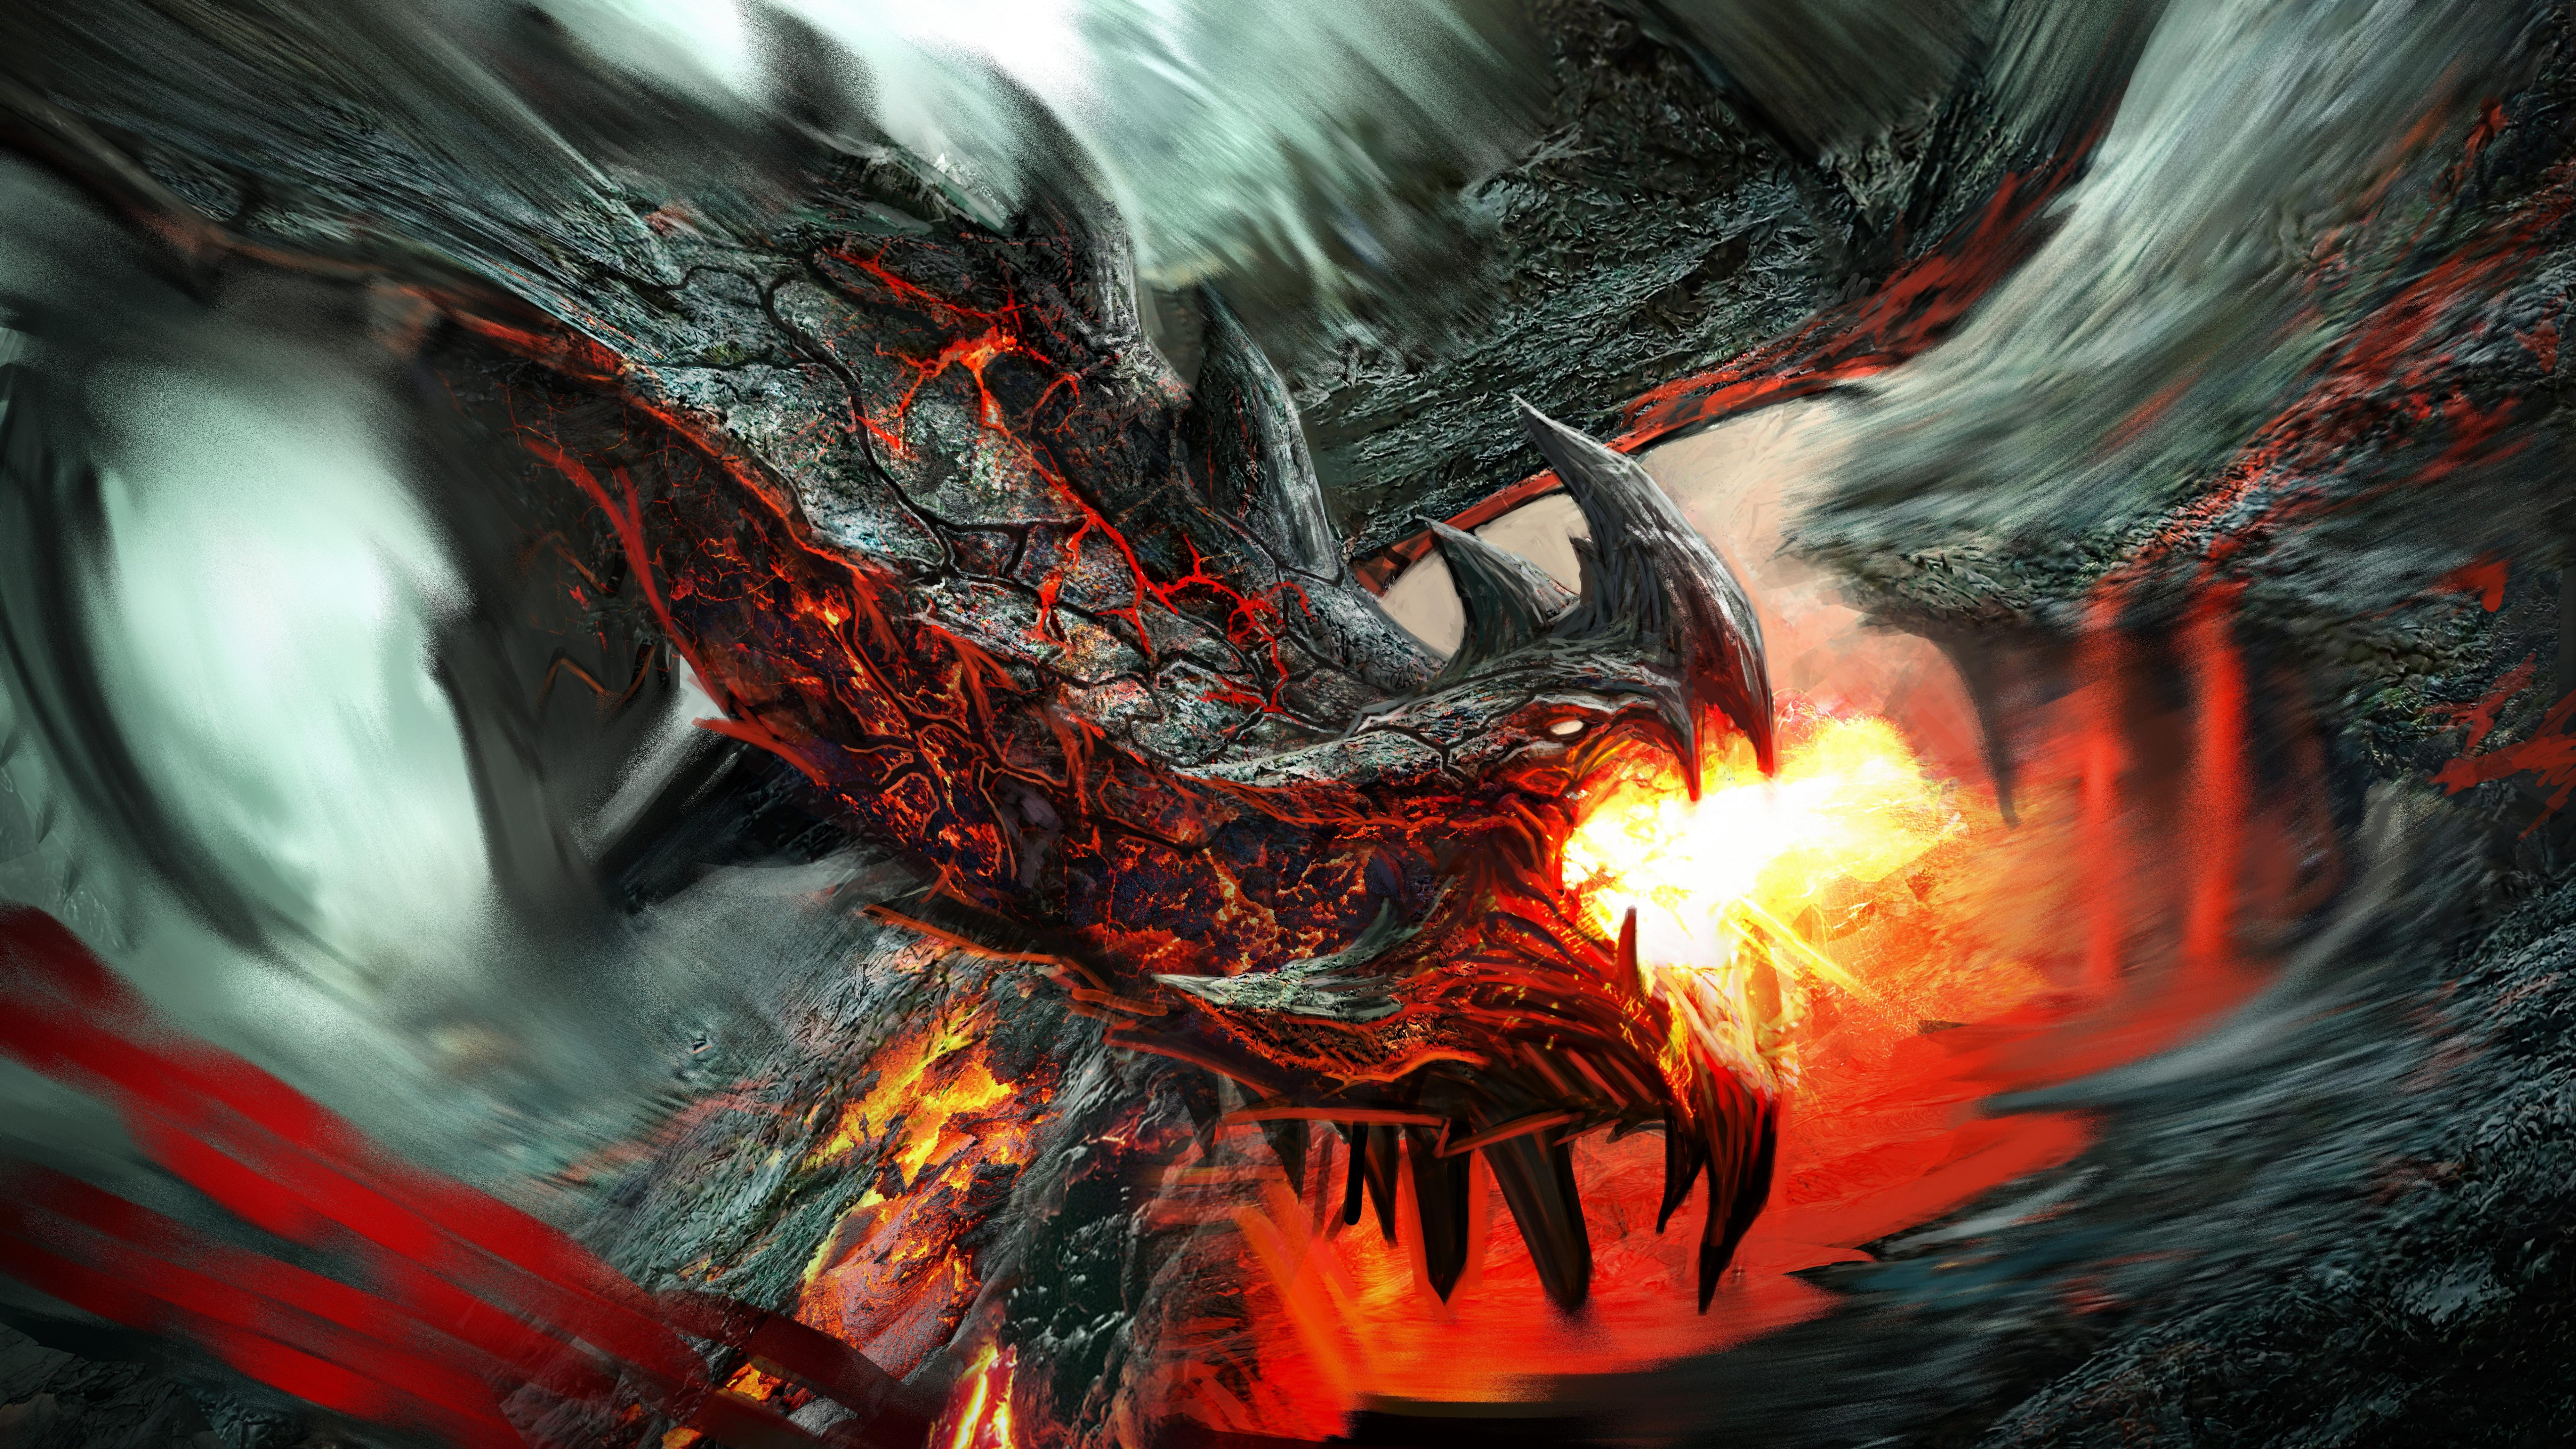 4K Ultra HD Dragon Wallpapers - Top Free 4K Ultra HD ...